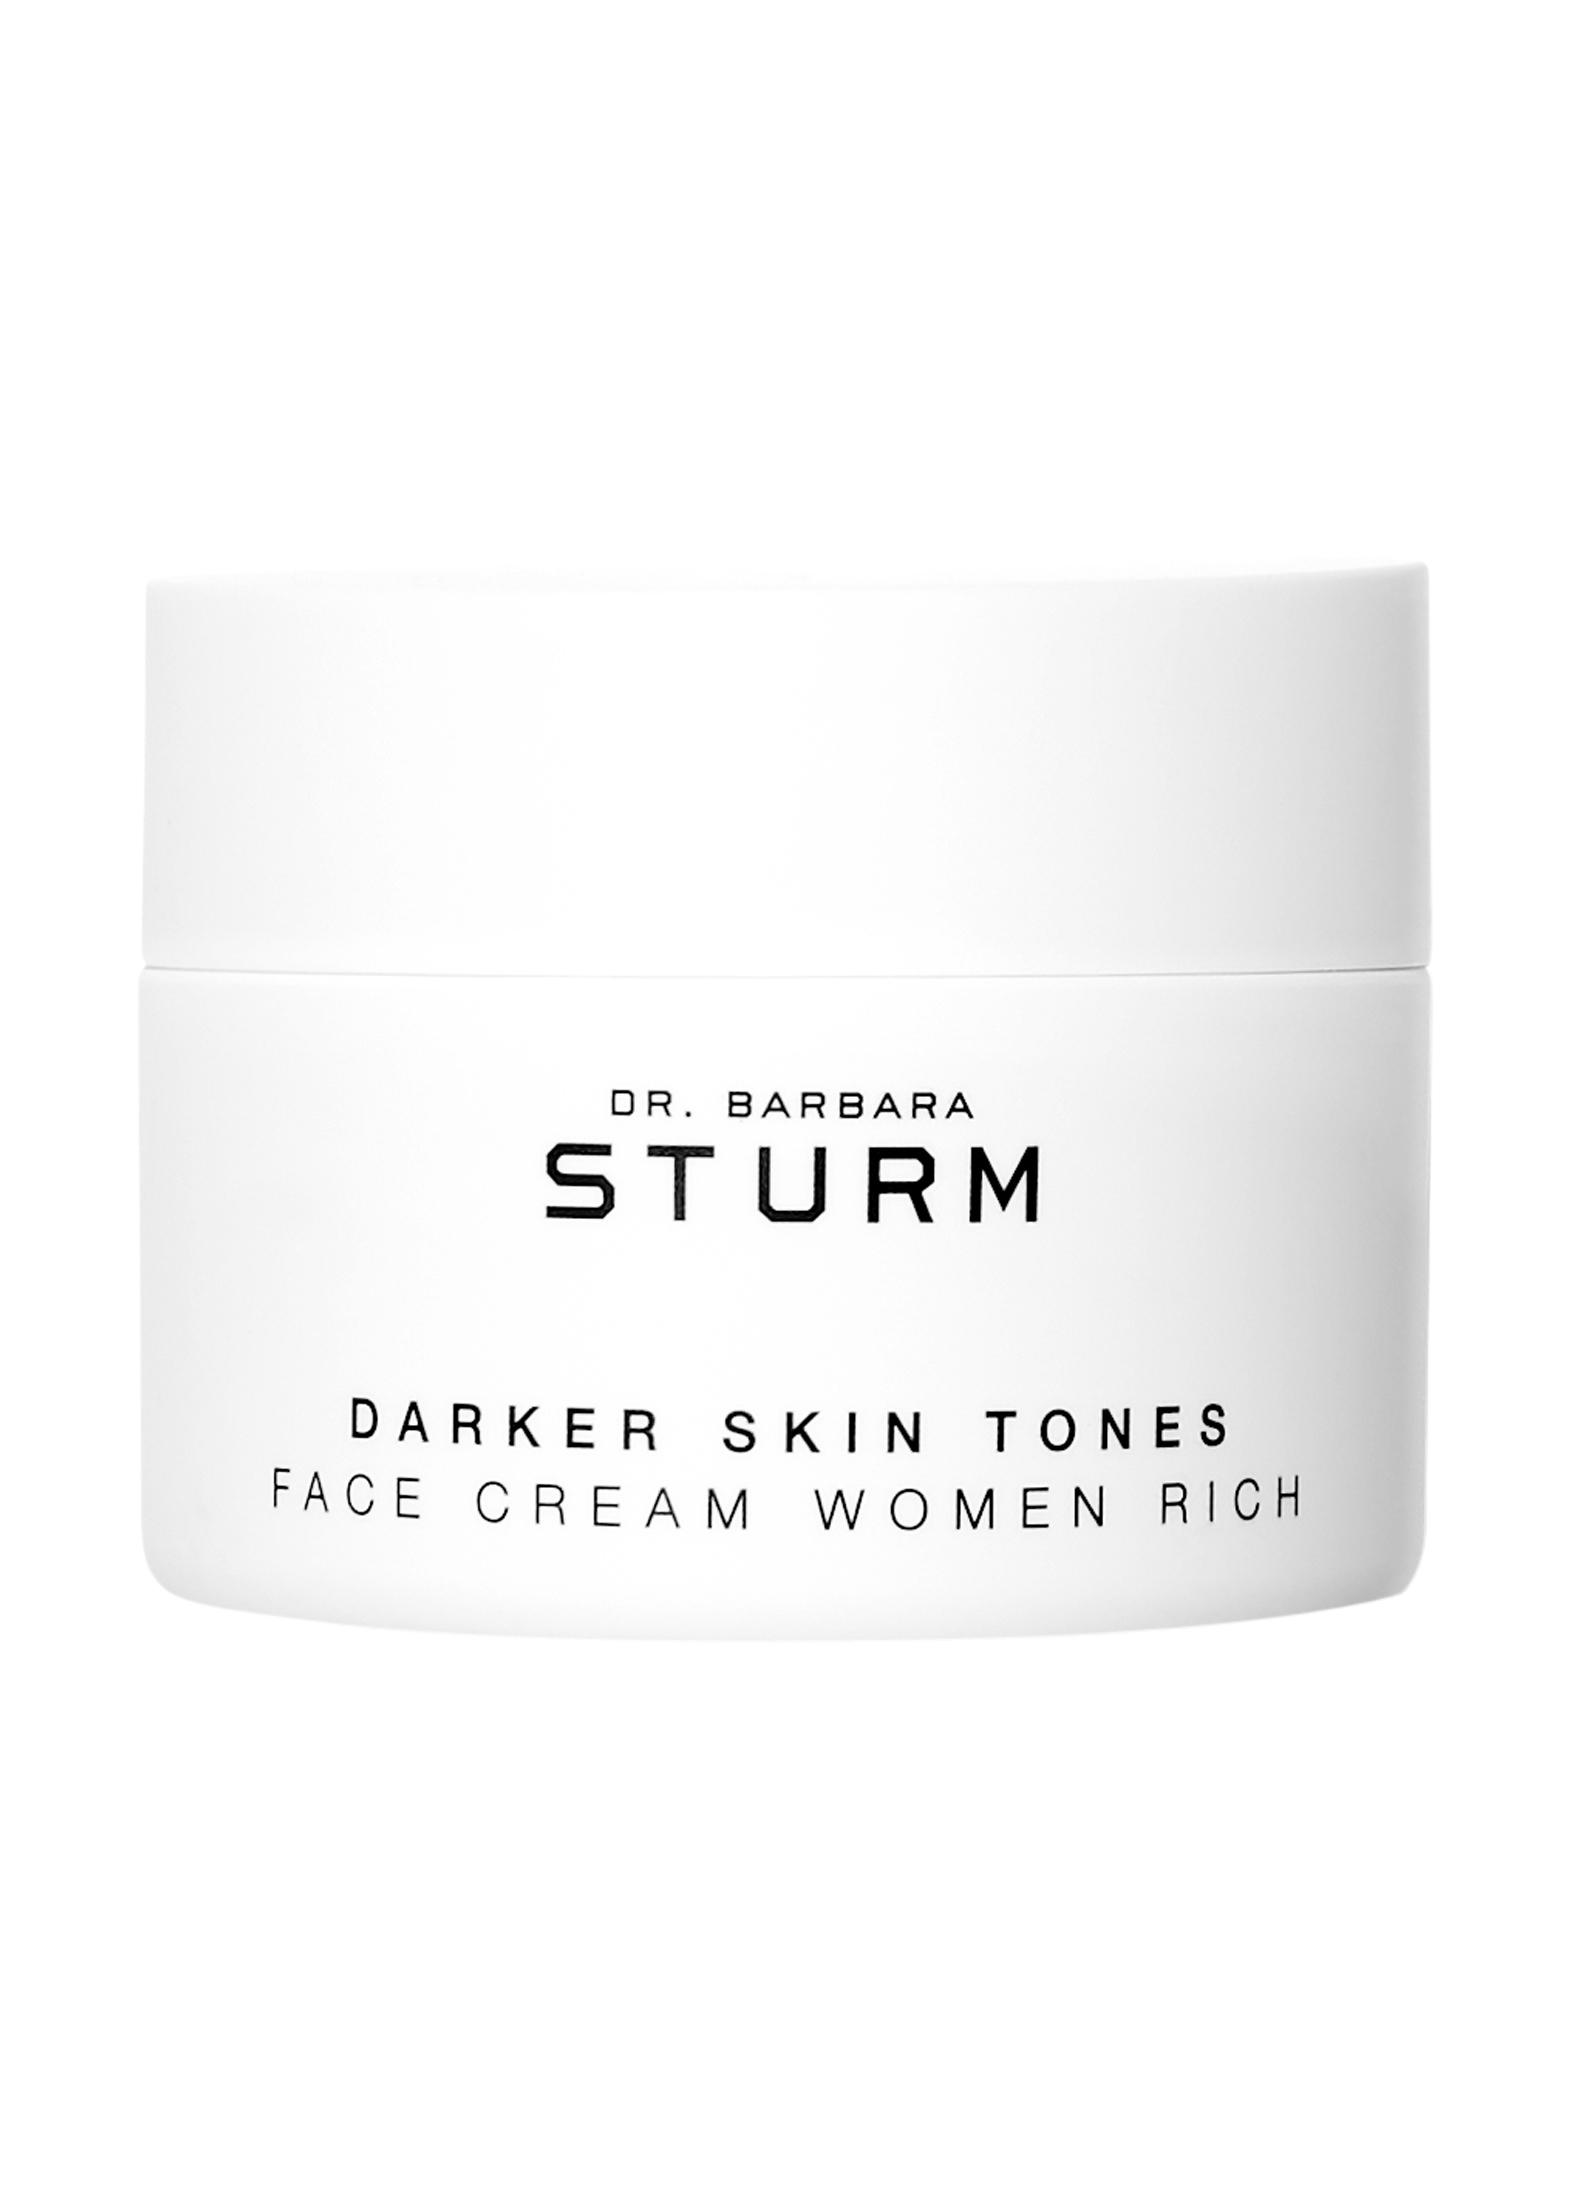 Darker Skin Tones Face Cream Rich 50ml image number 0